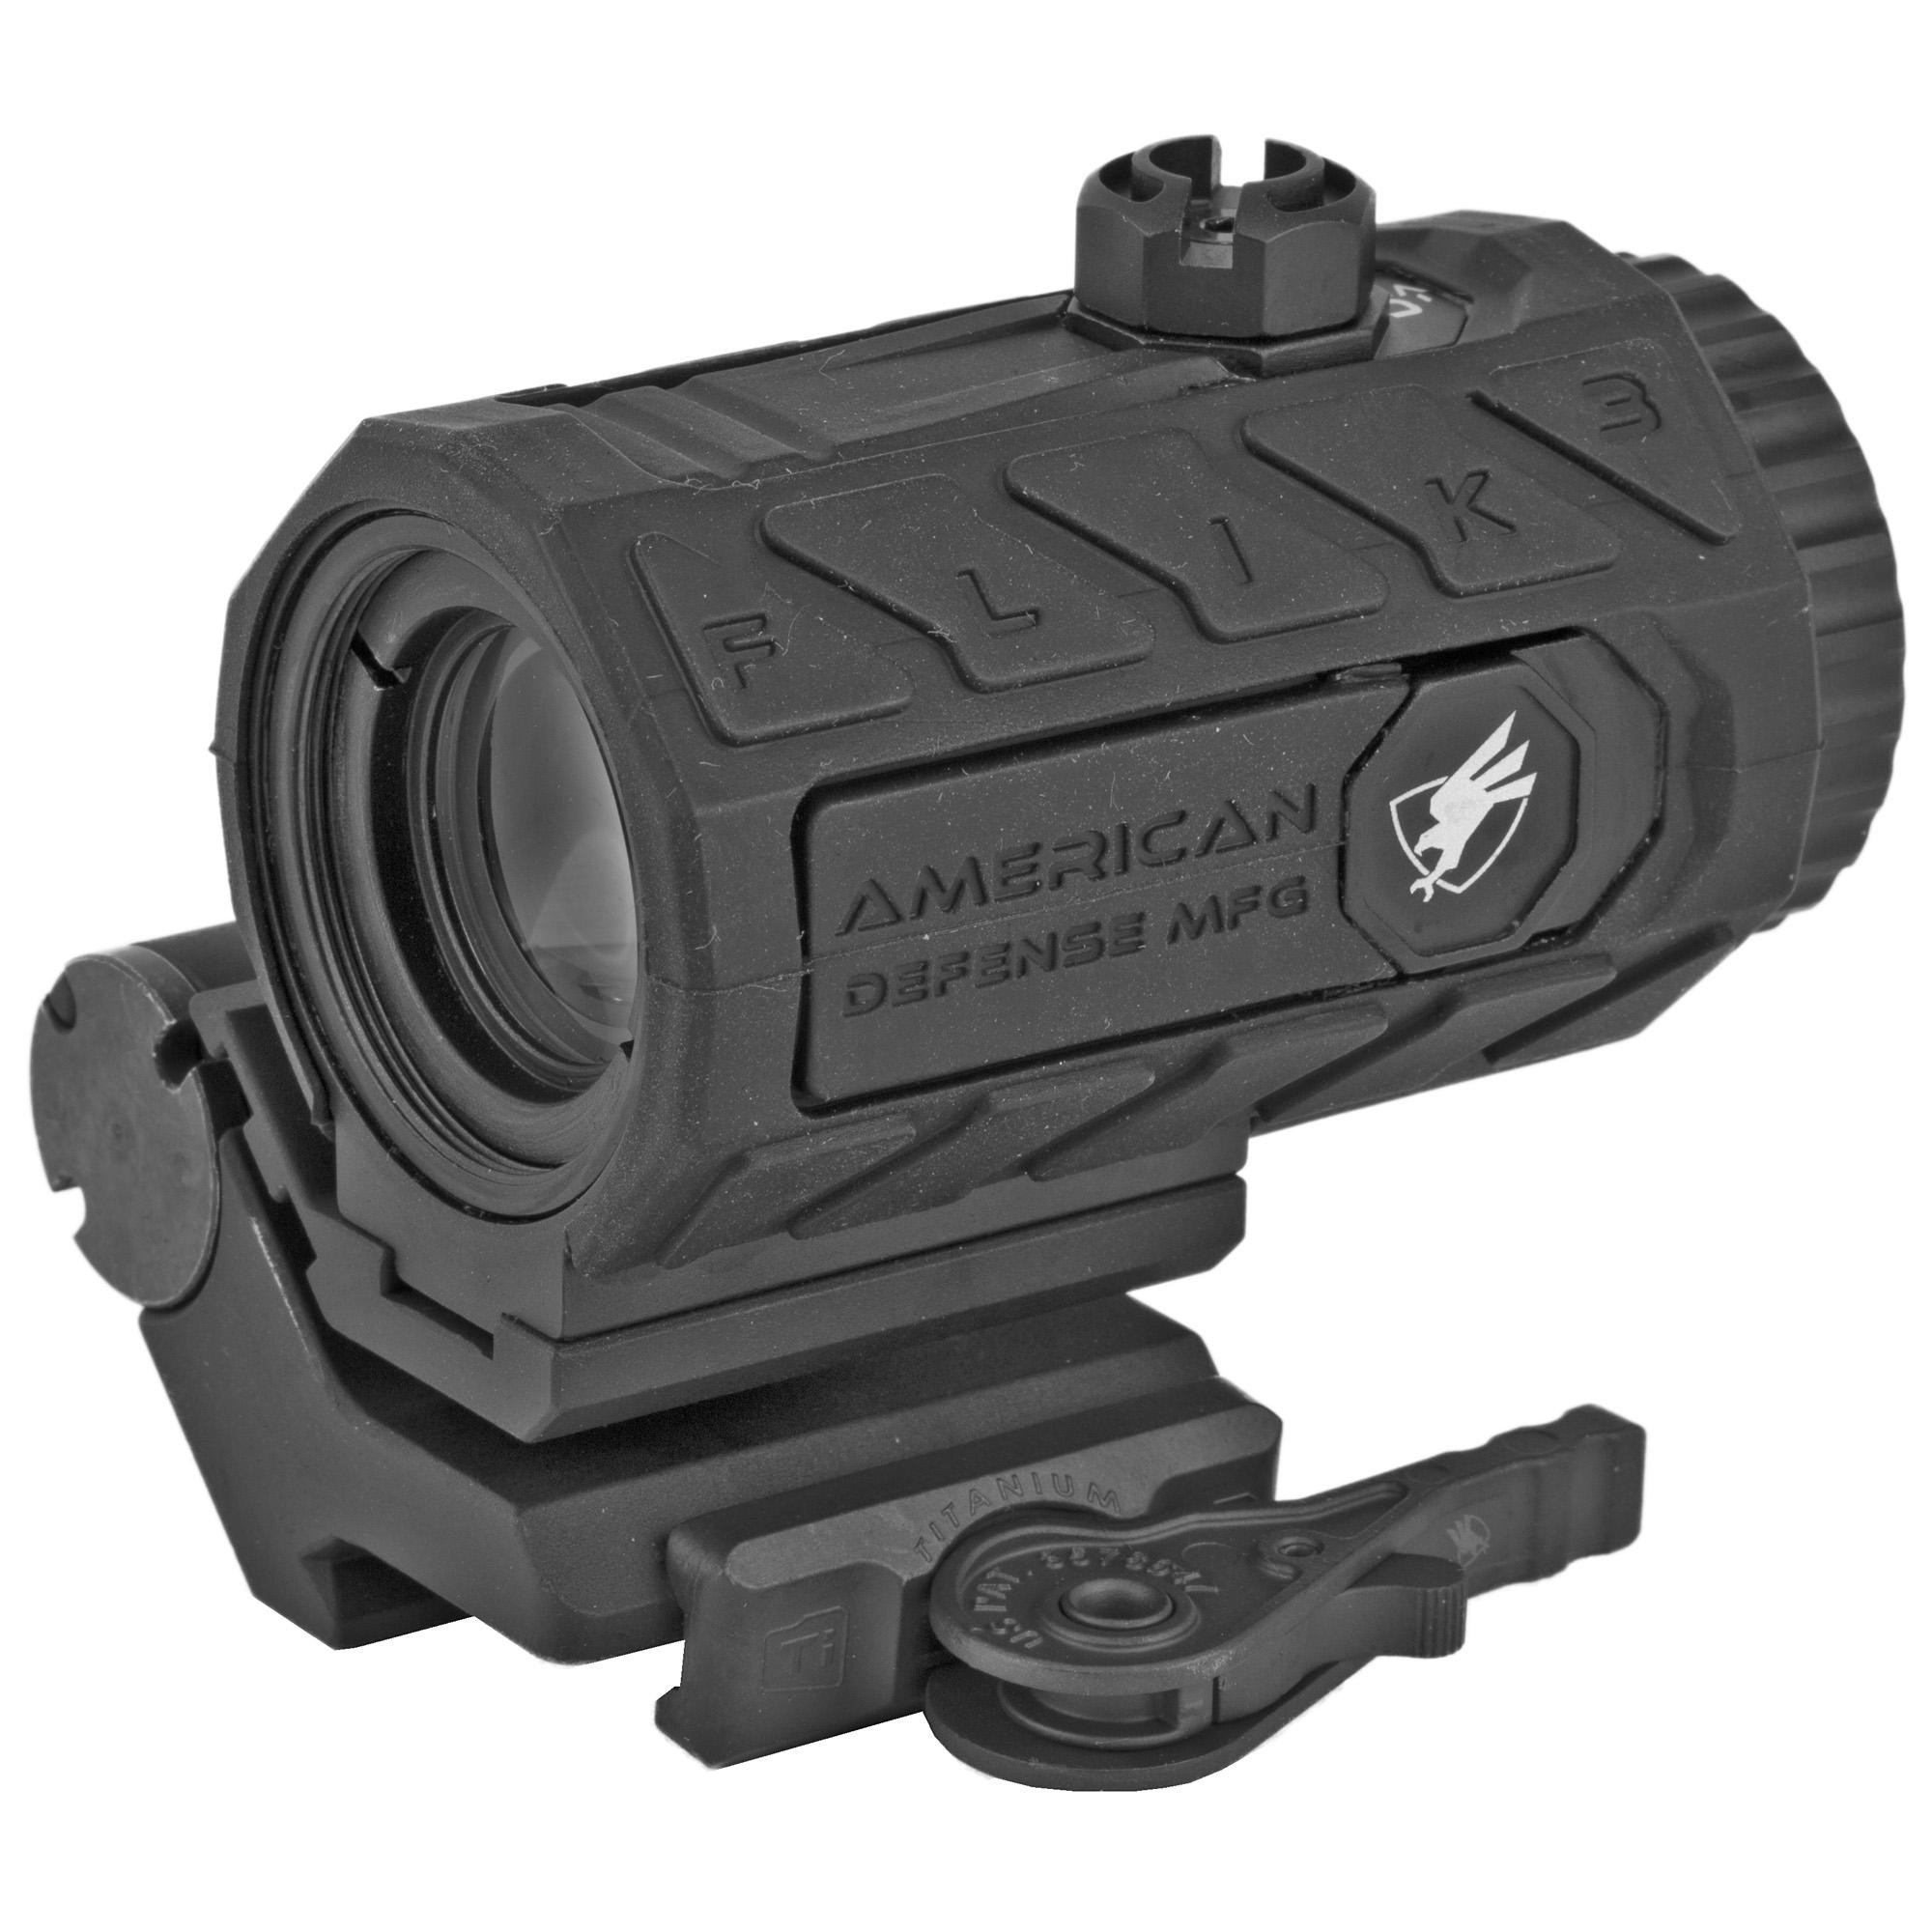 Am Def Flik3 Fixed 3x Pwr Magnifier